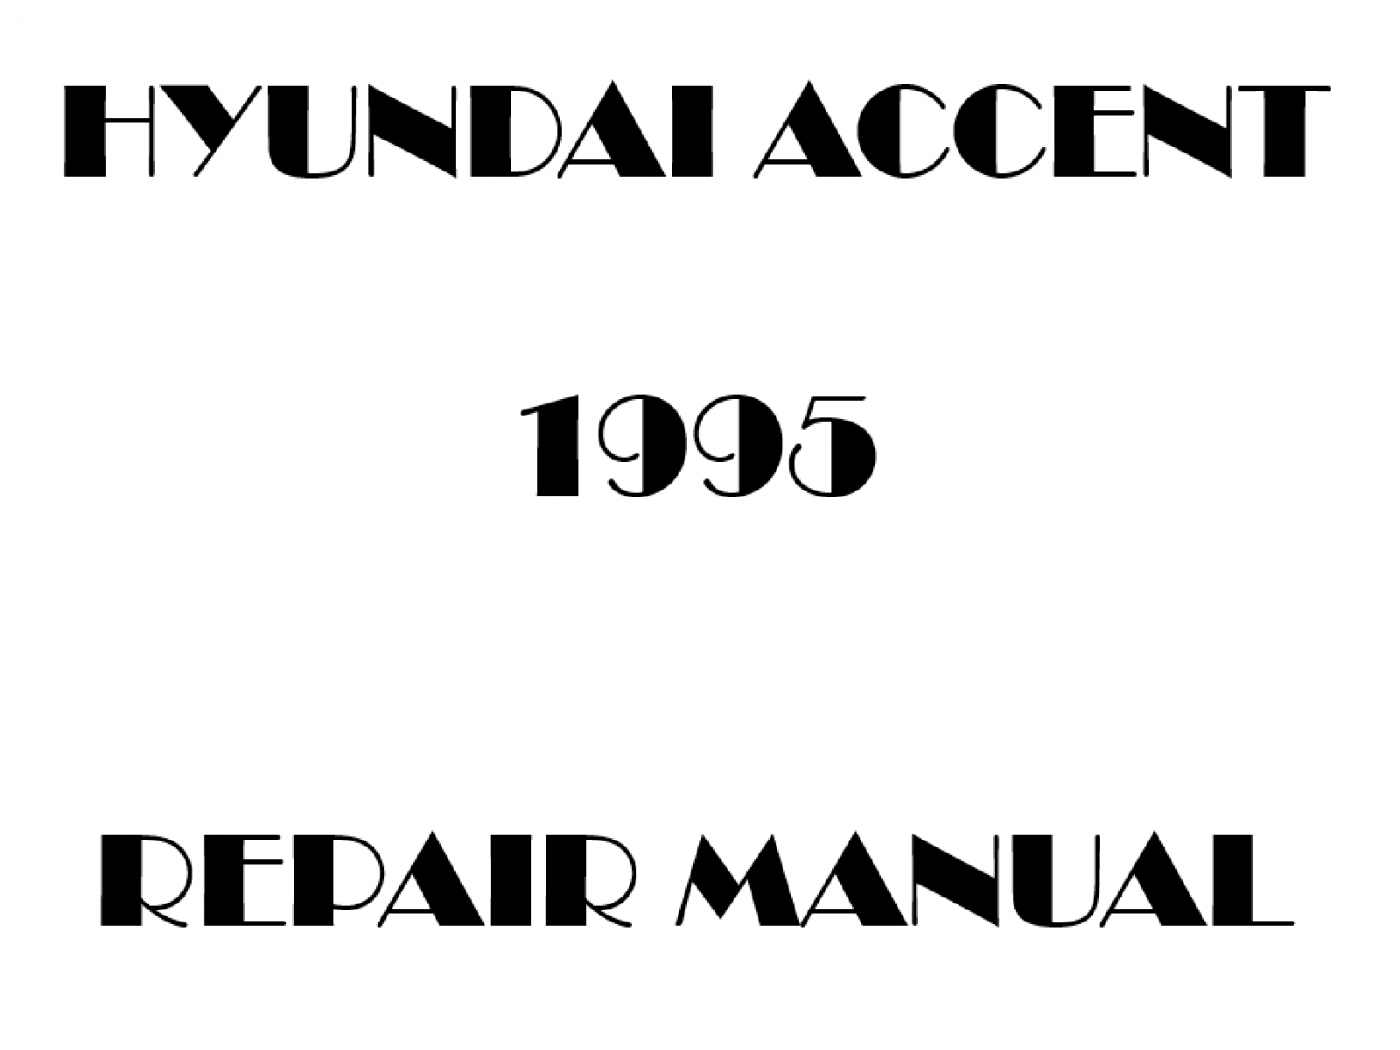 1995 Hyundai Accent repair manual